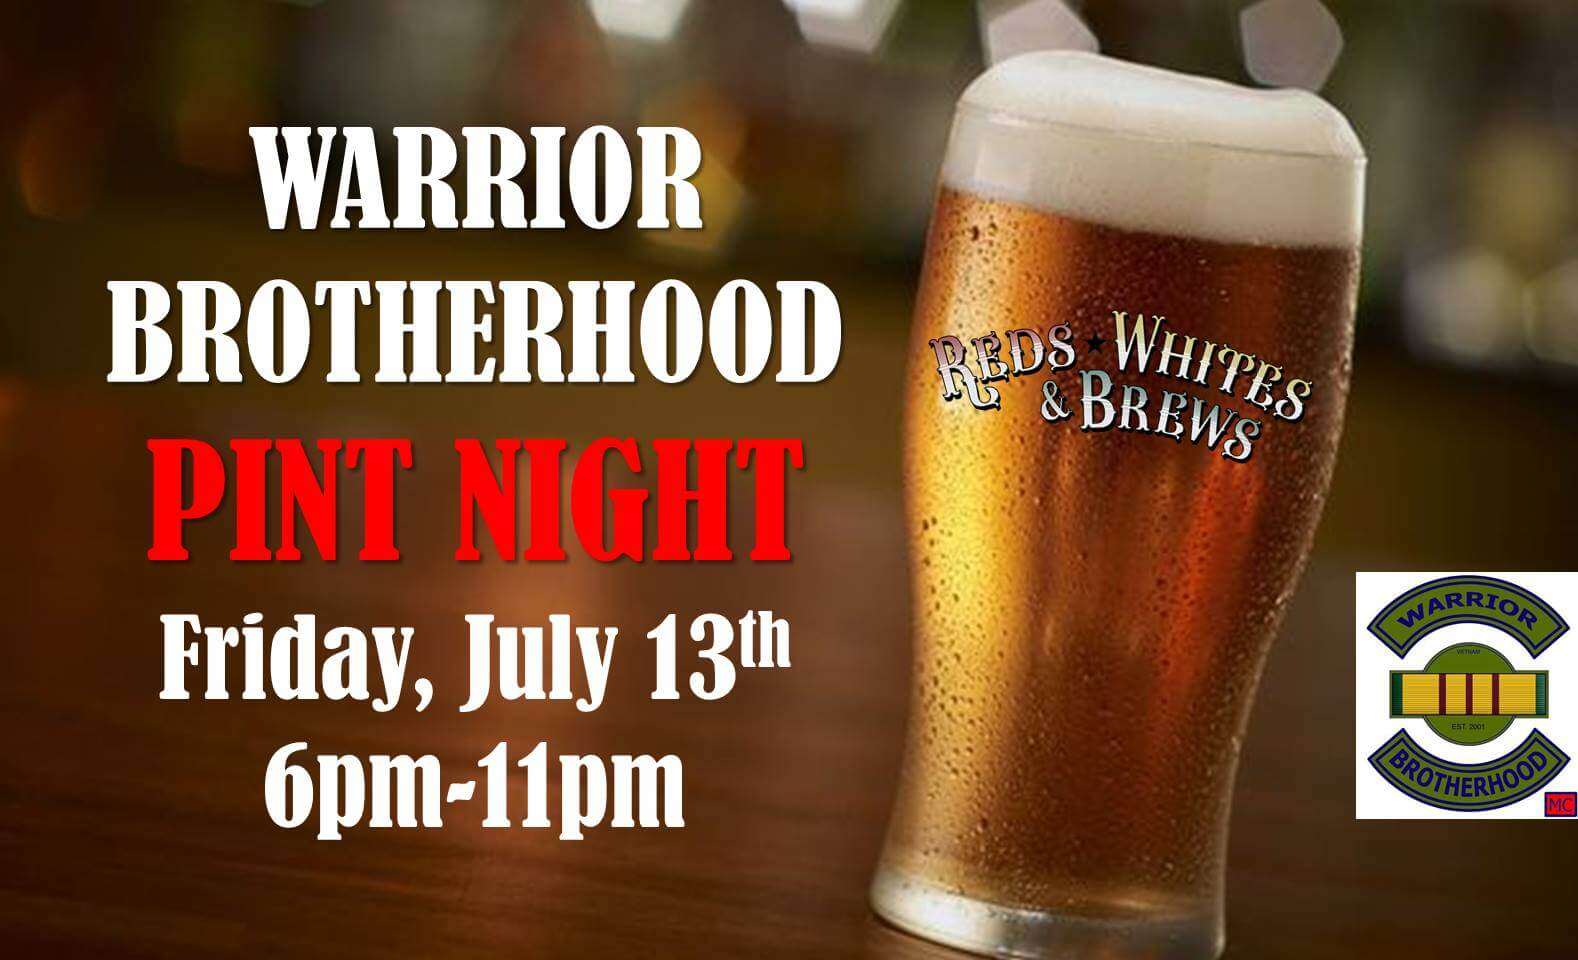 Warrior Brotherhood Pint Night